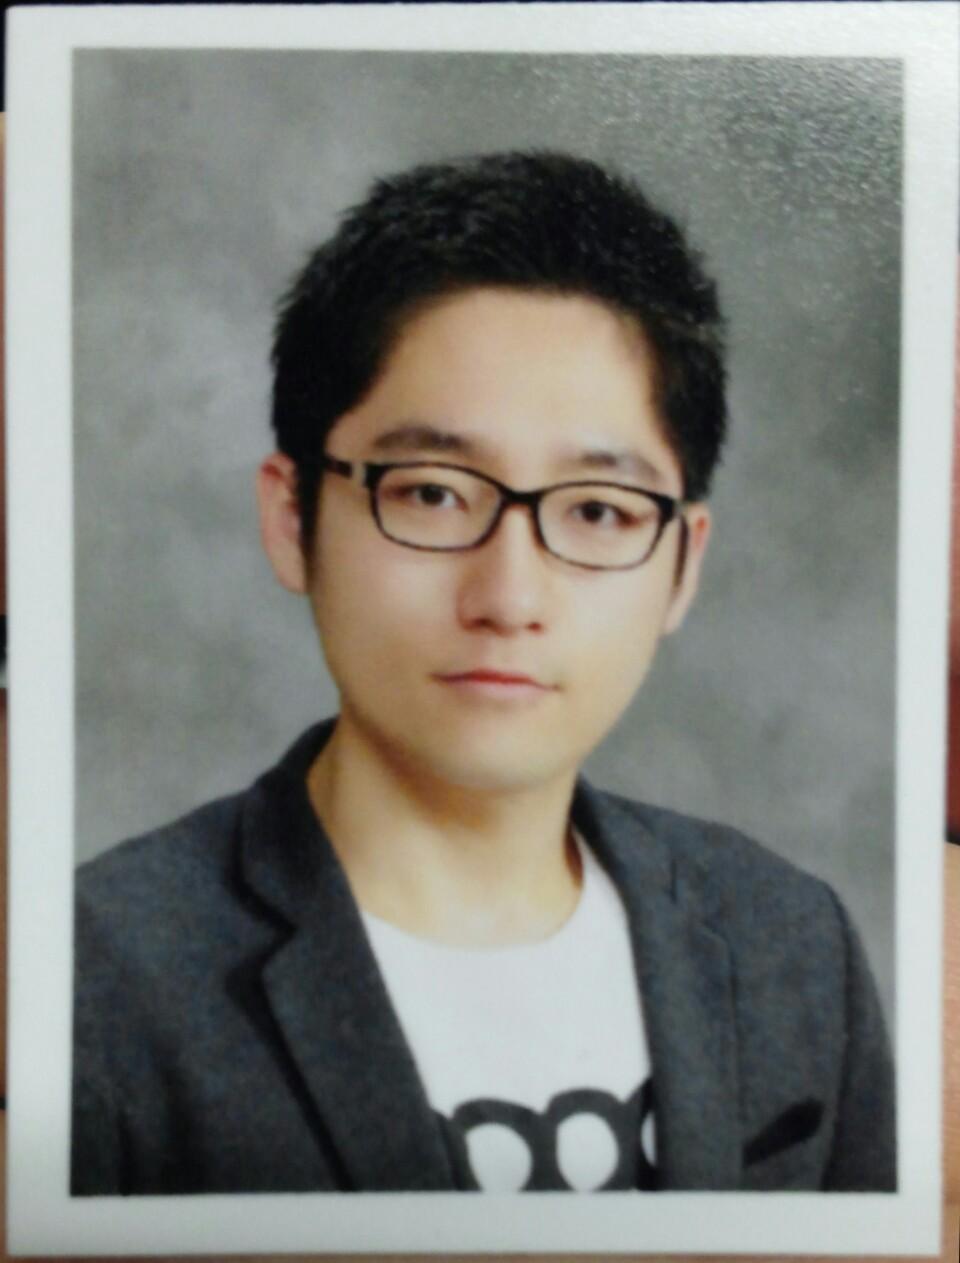 Ju-won Lee